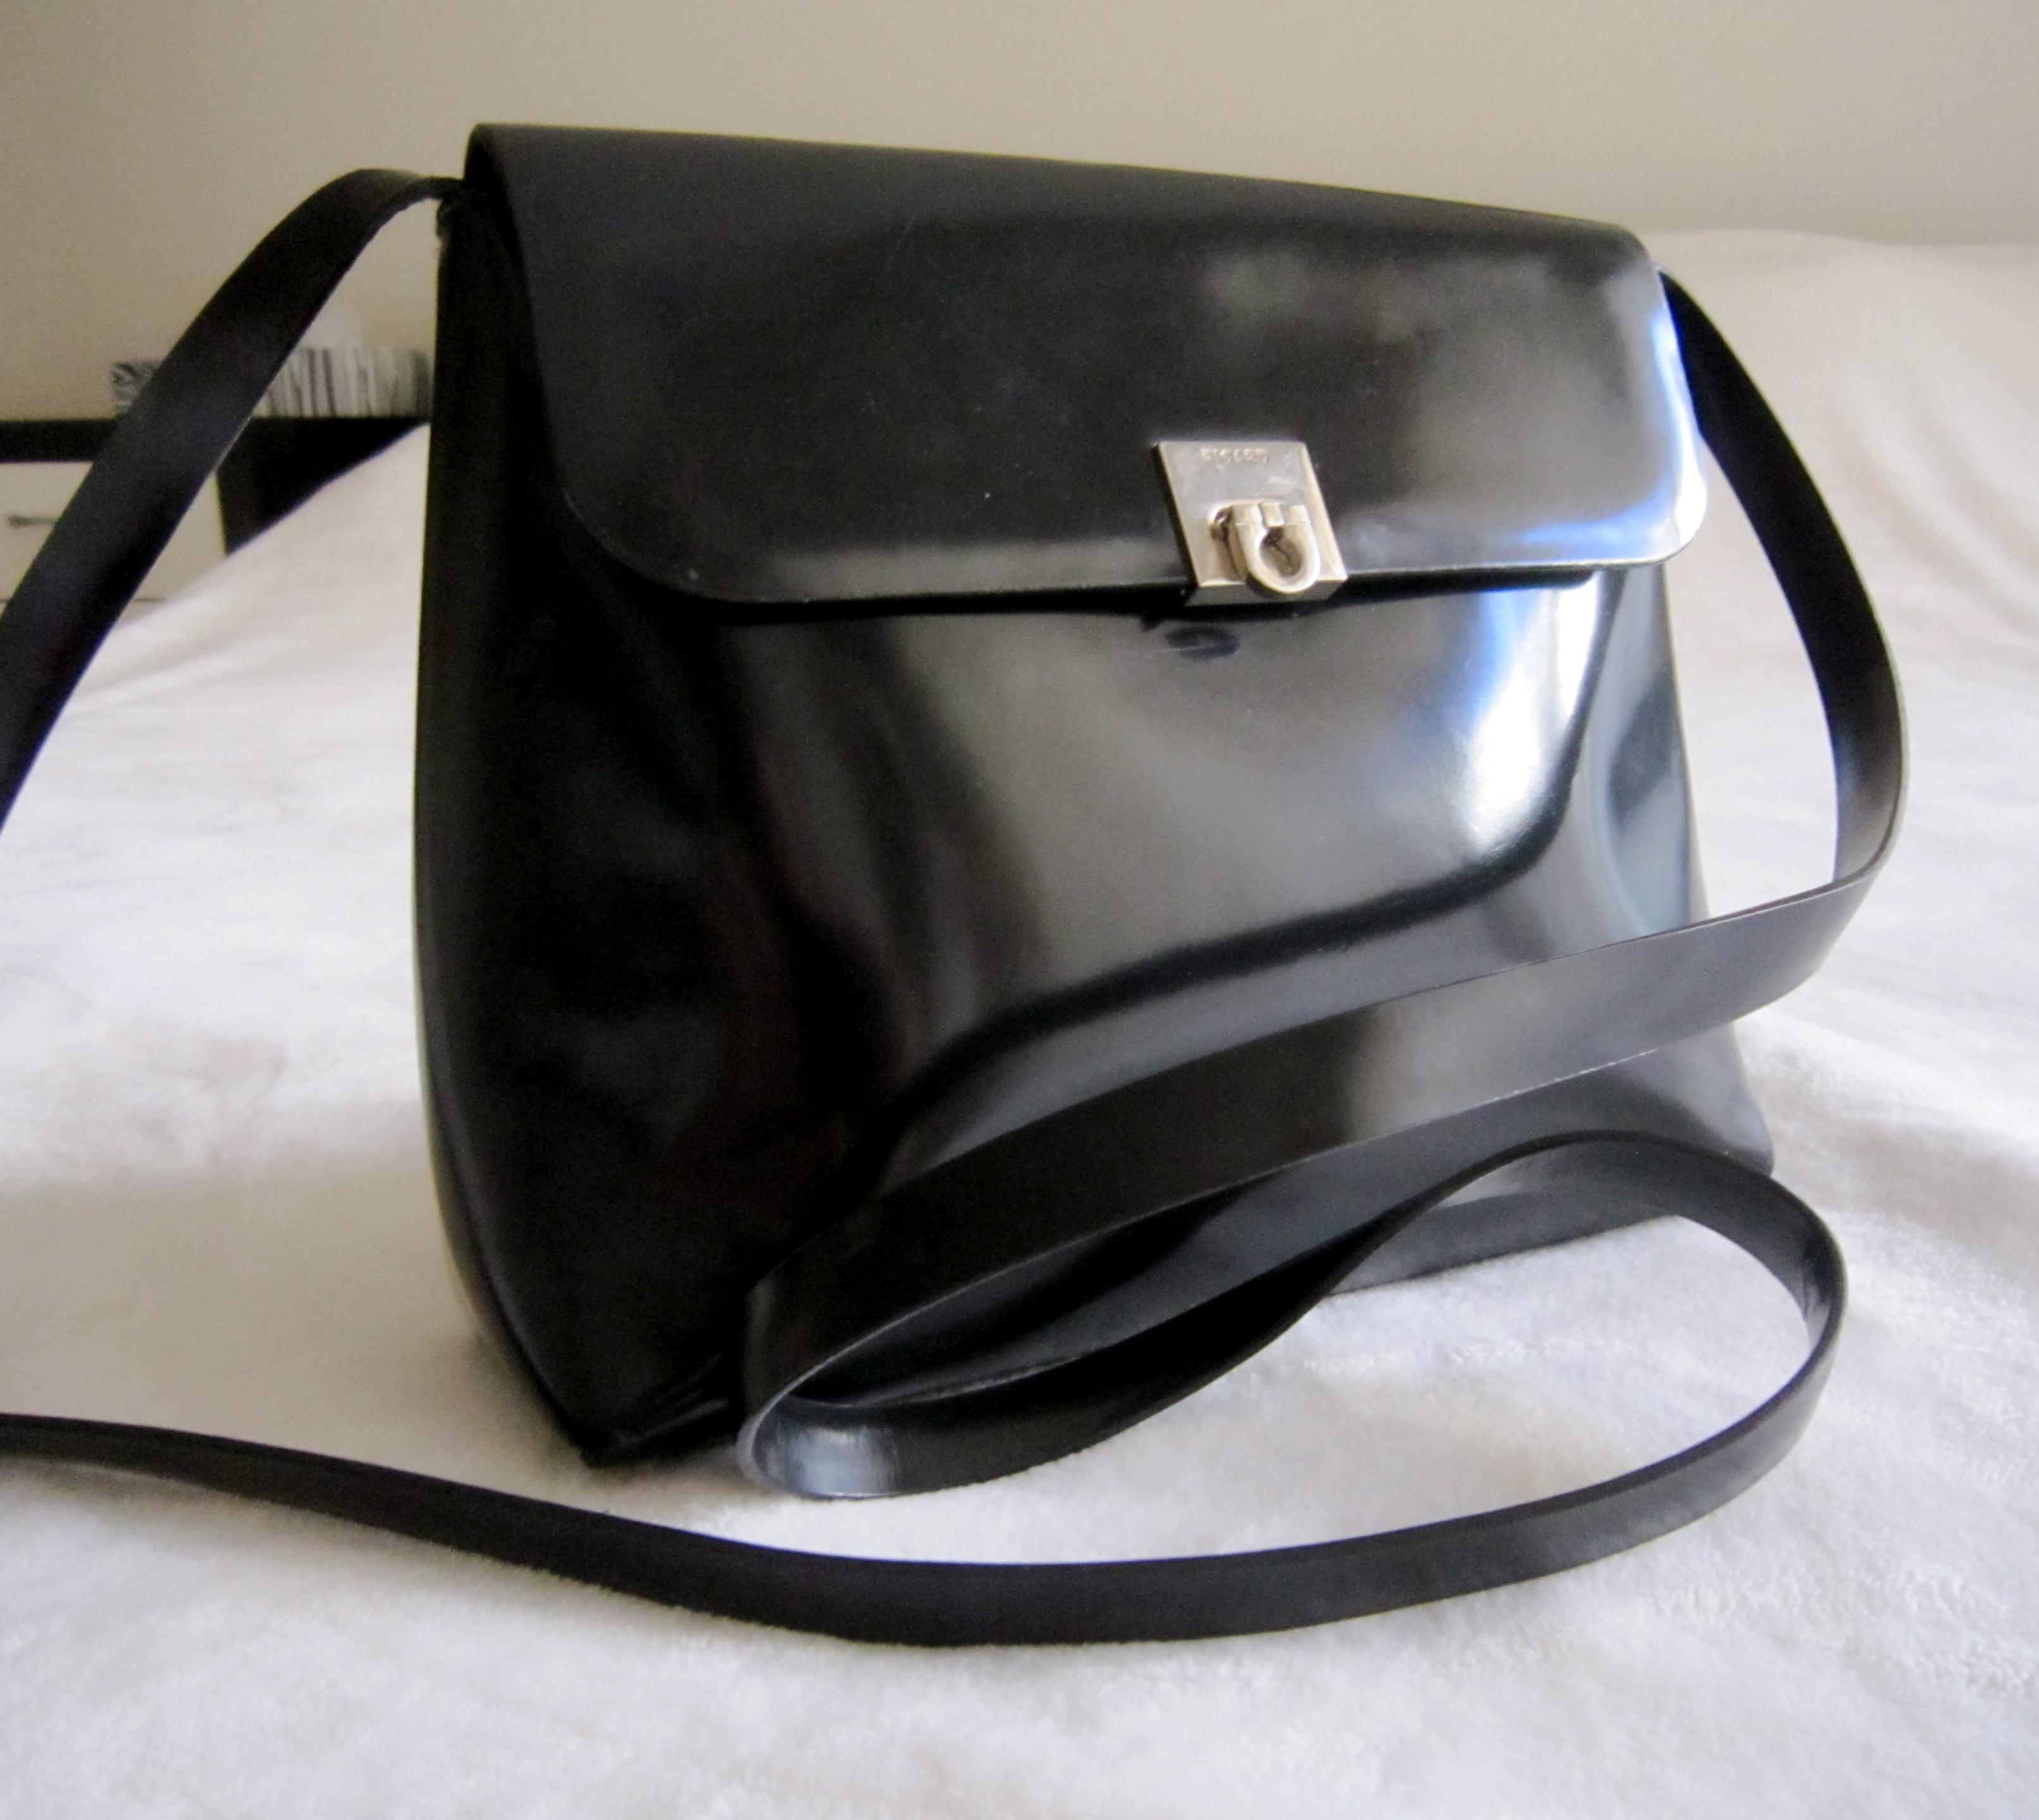 173b8be82 Picard Black Patent Leather Crossbody - Luxurylana Boutique